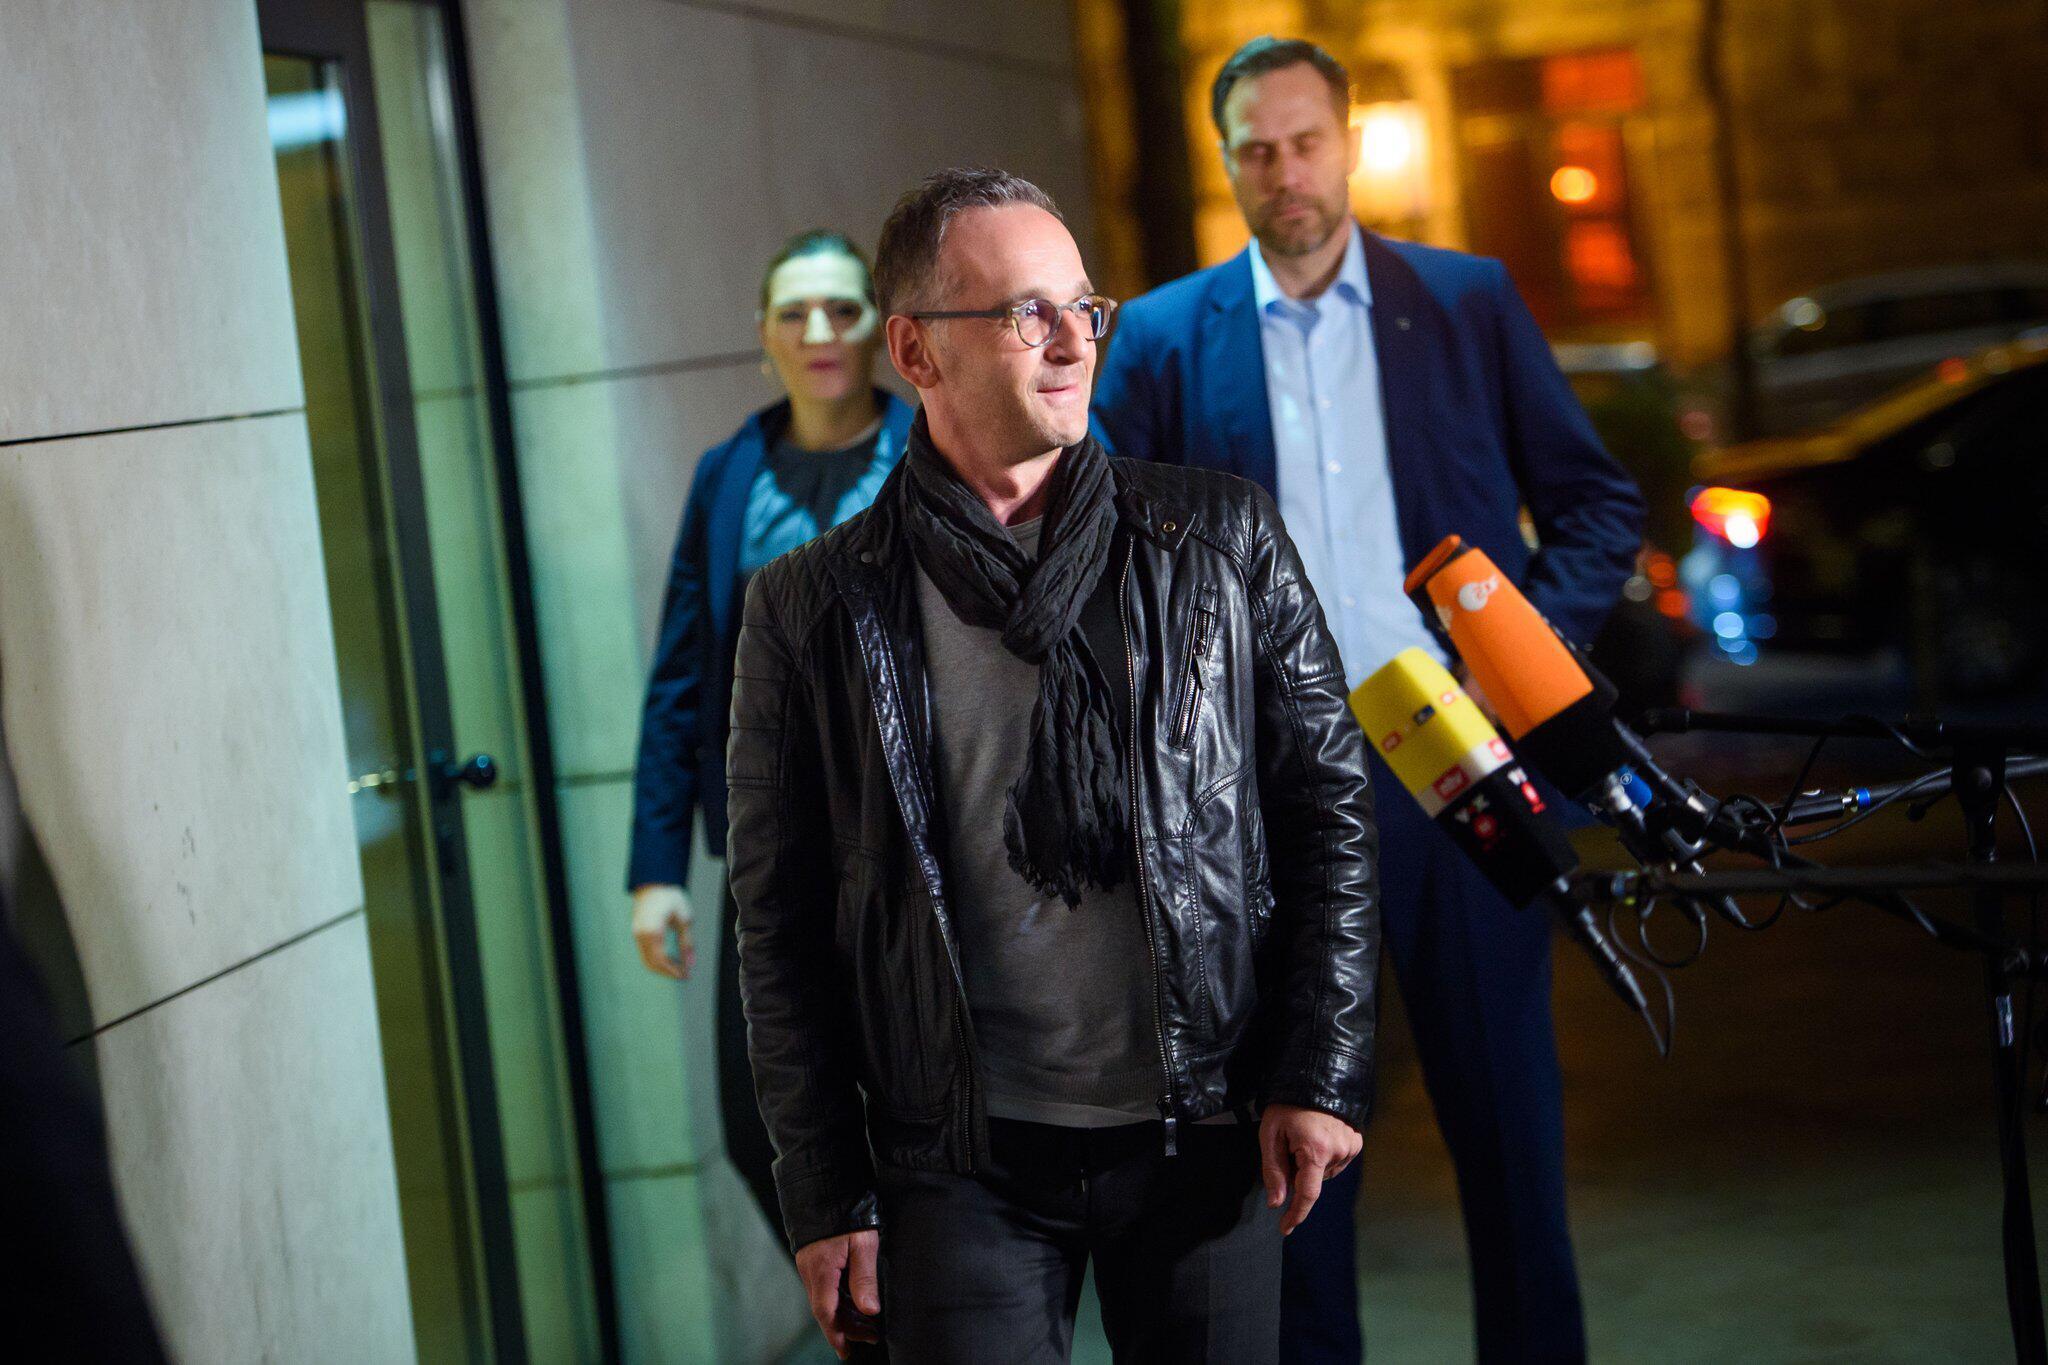 Bild zu SPD retreat, Heiko Maas